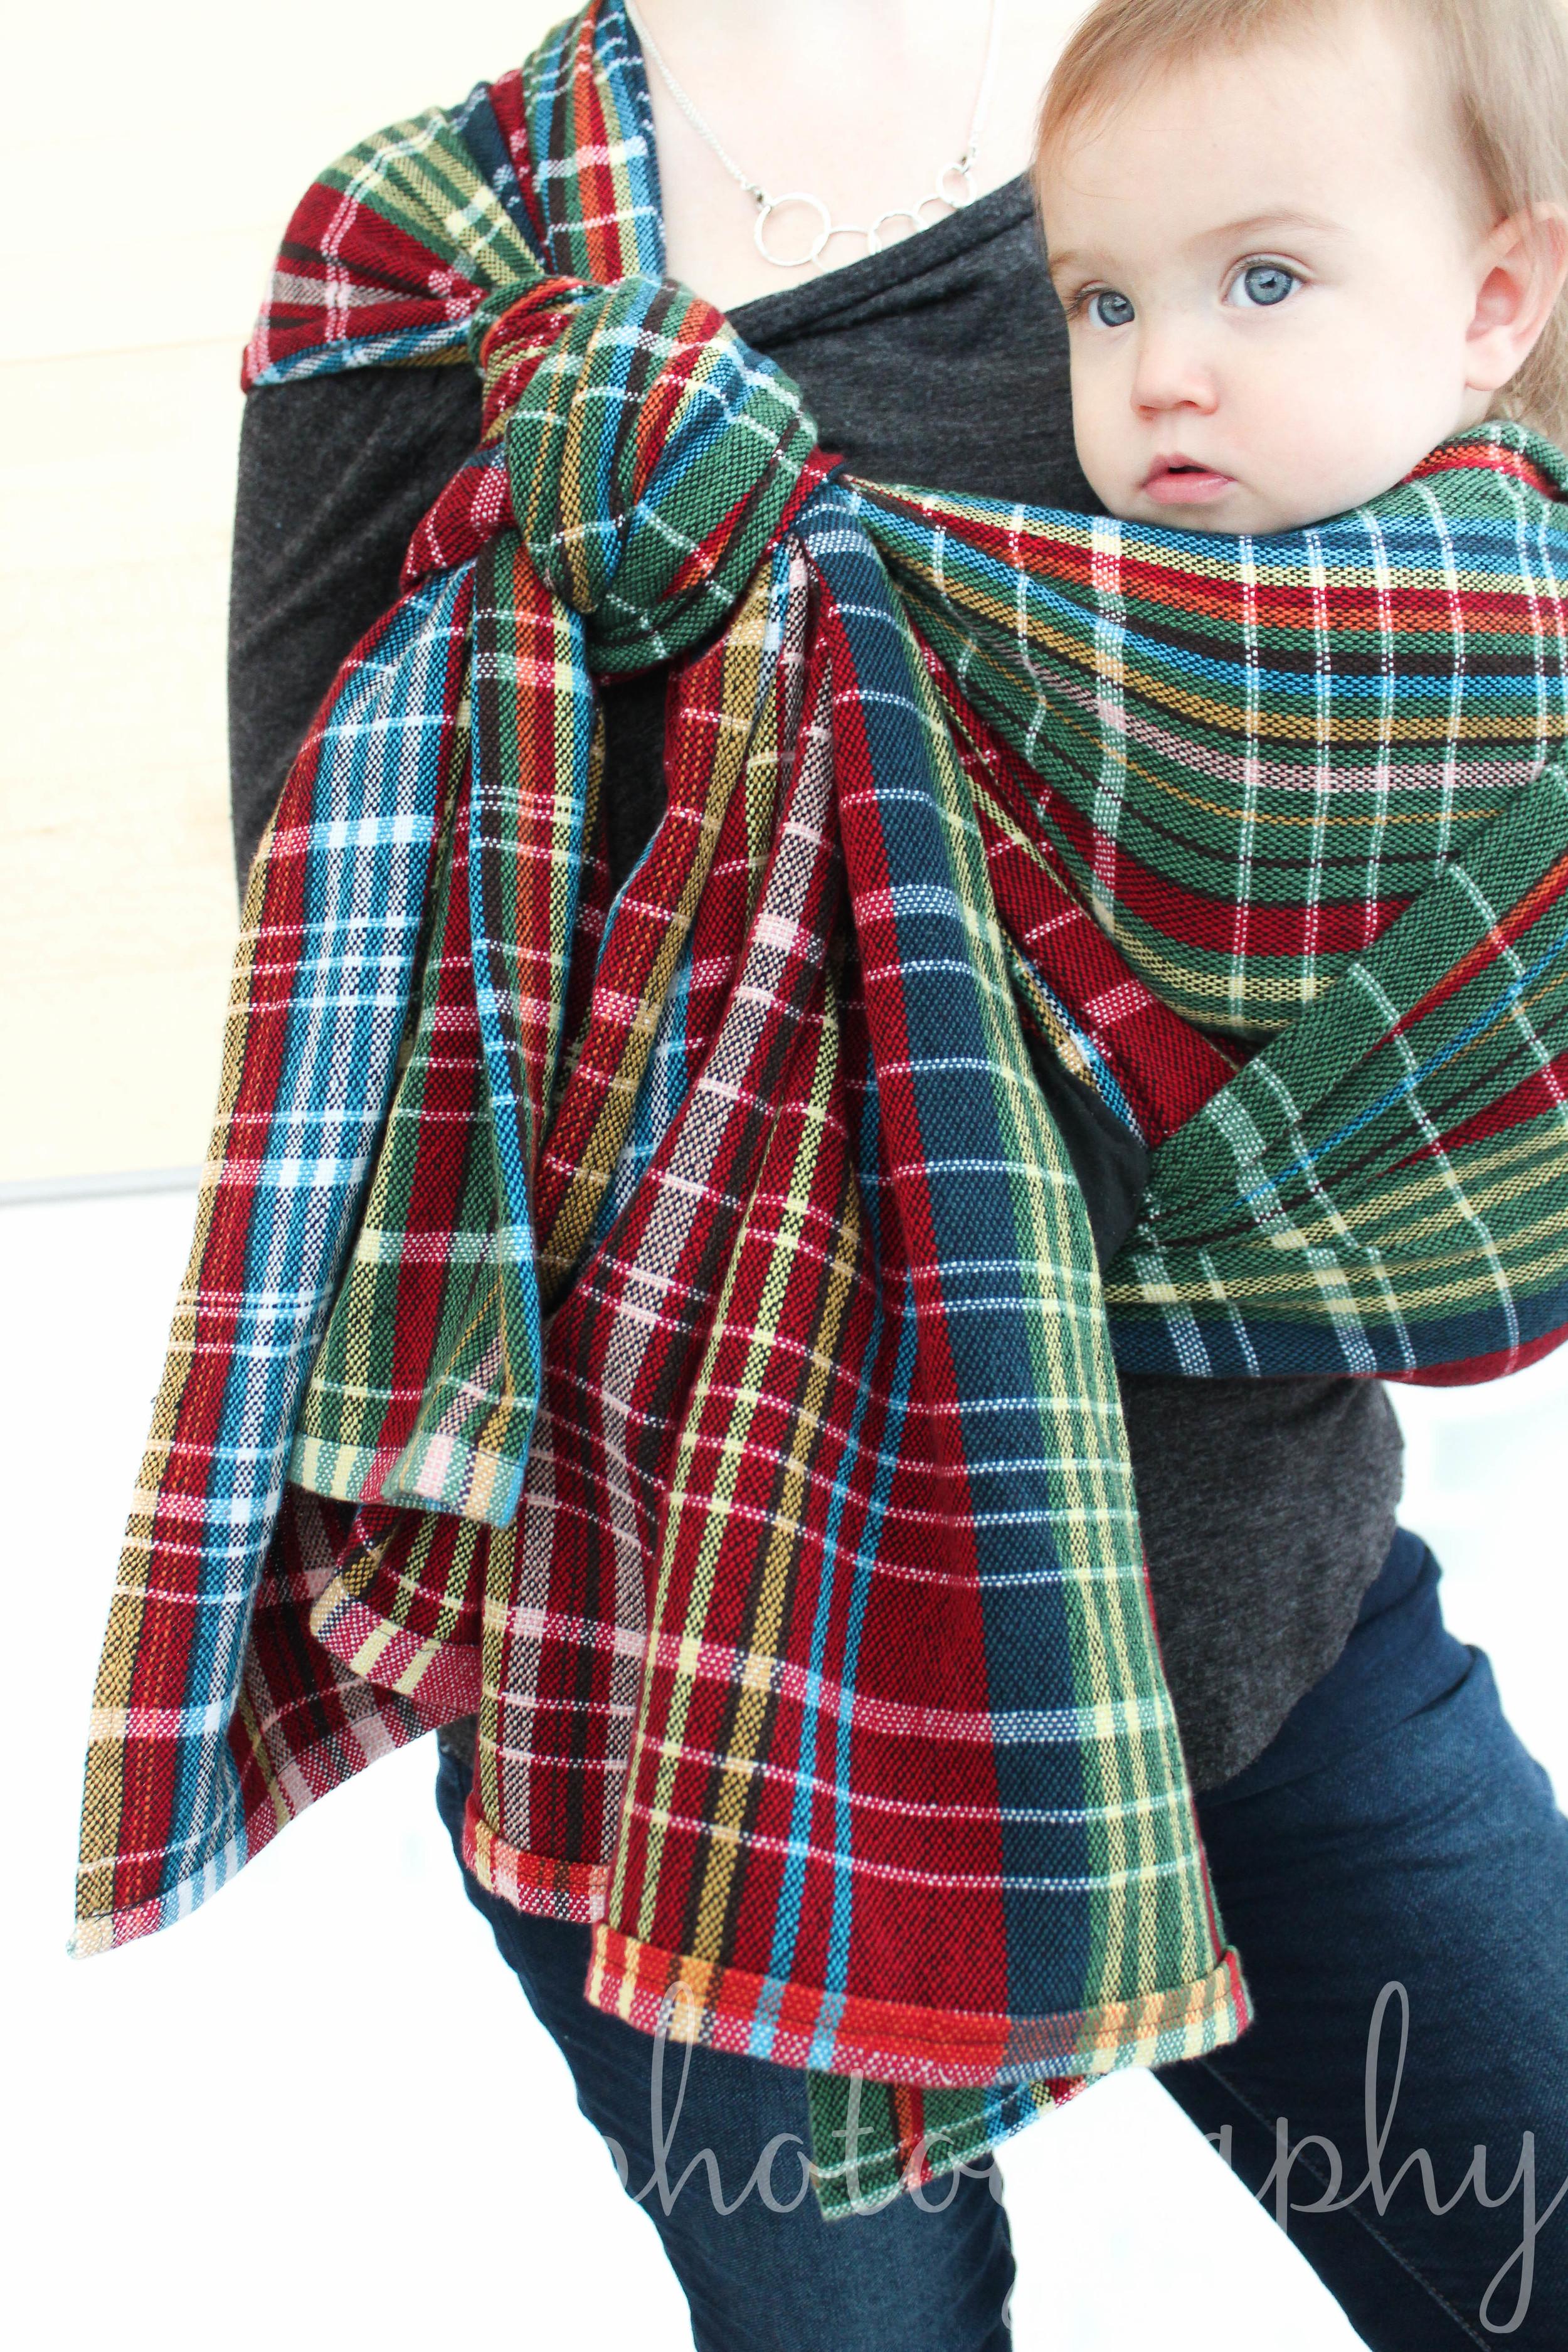 Good Night Moon Handwoven Babywearing Wrap   14 Mile Farm Handwoven Baby Wraps and Heirloom Textiles